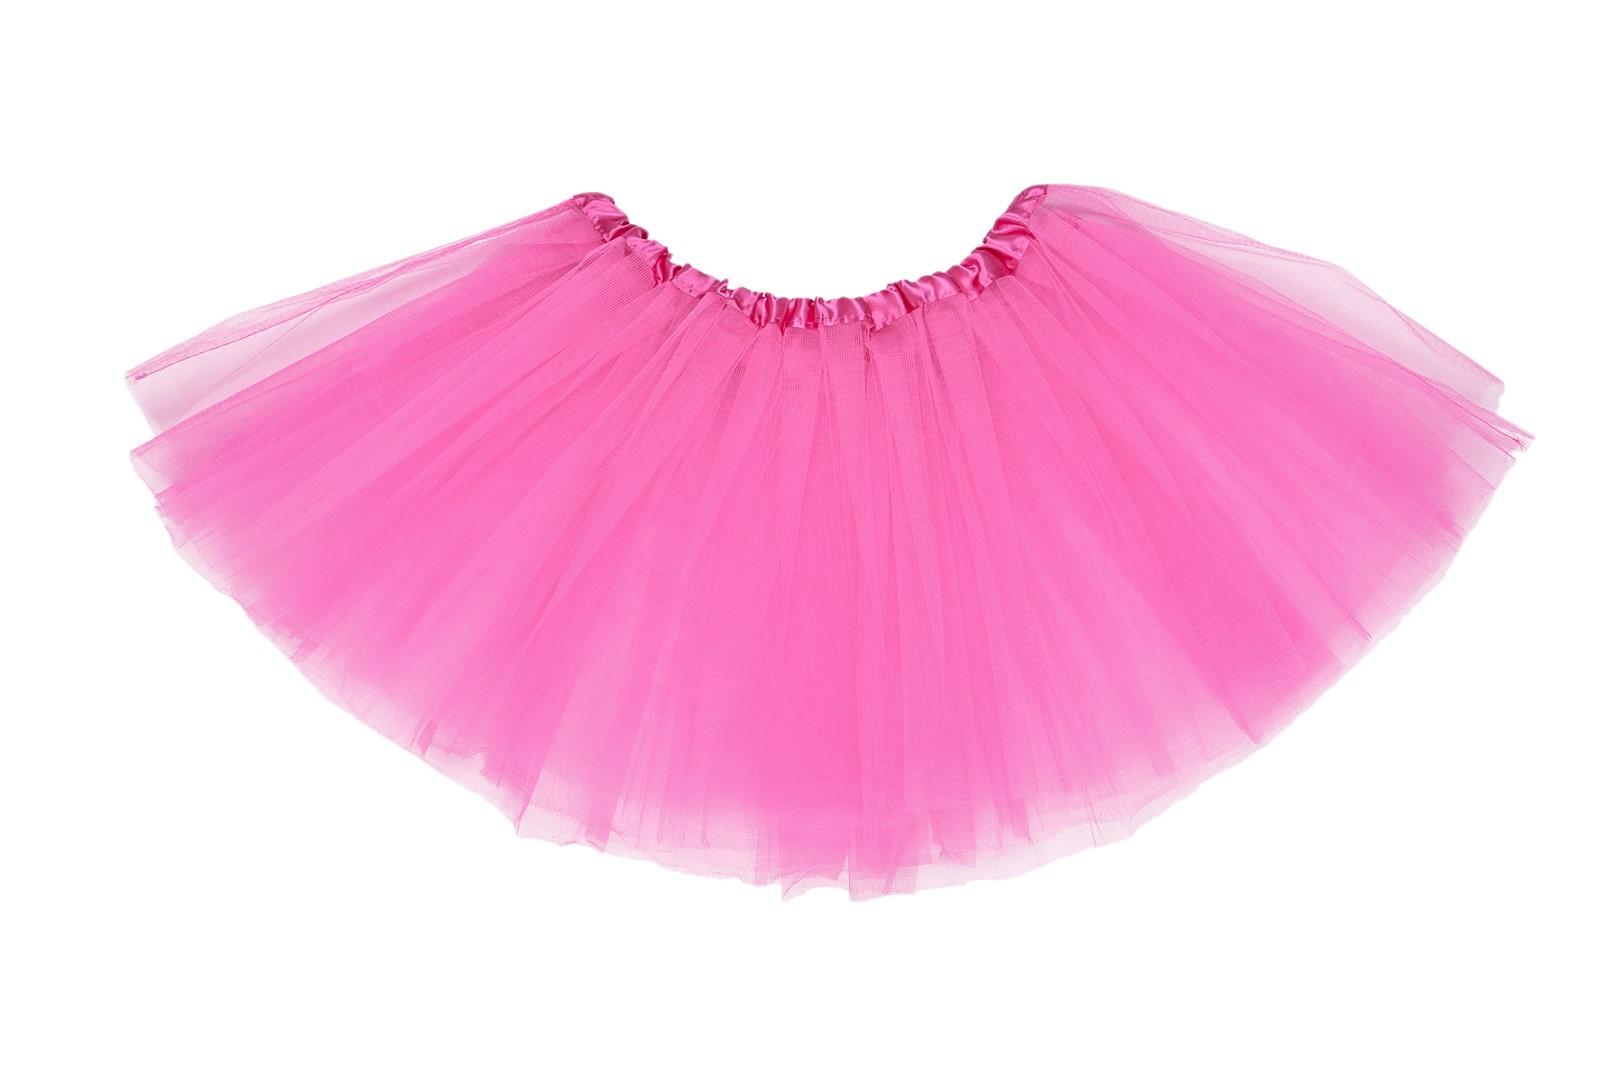 GIRLS PETTICOAT TUTU SKIRT 80S DANCE COSTUME FANCY